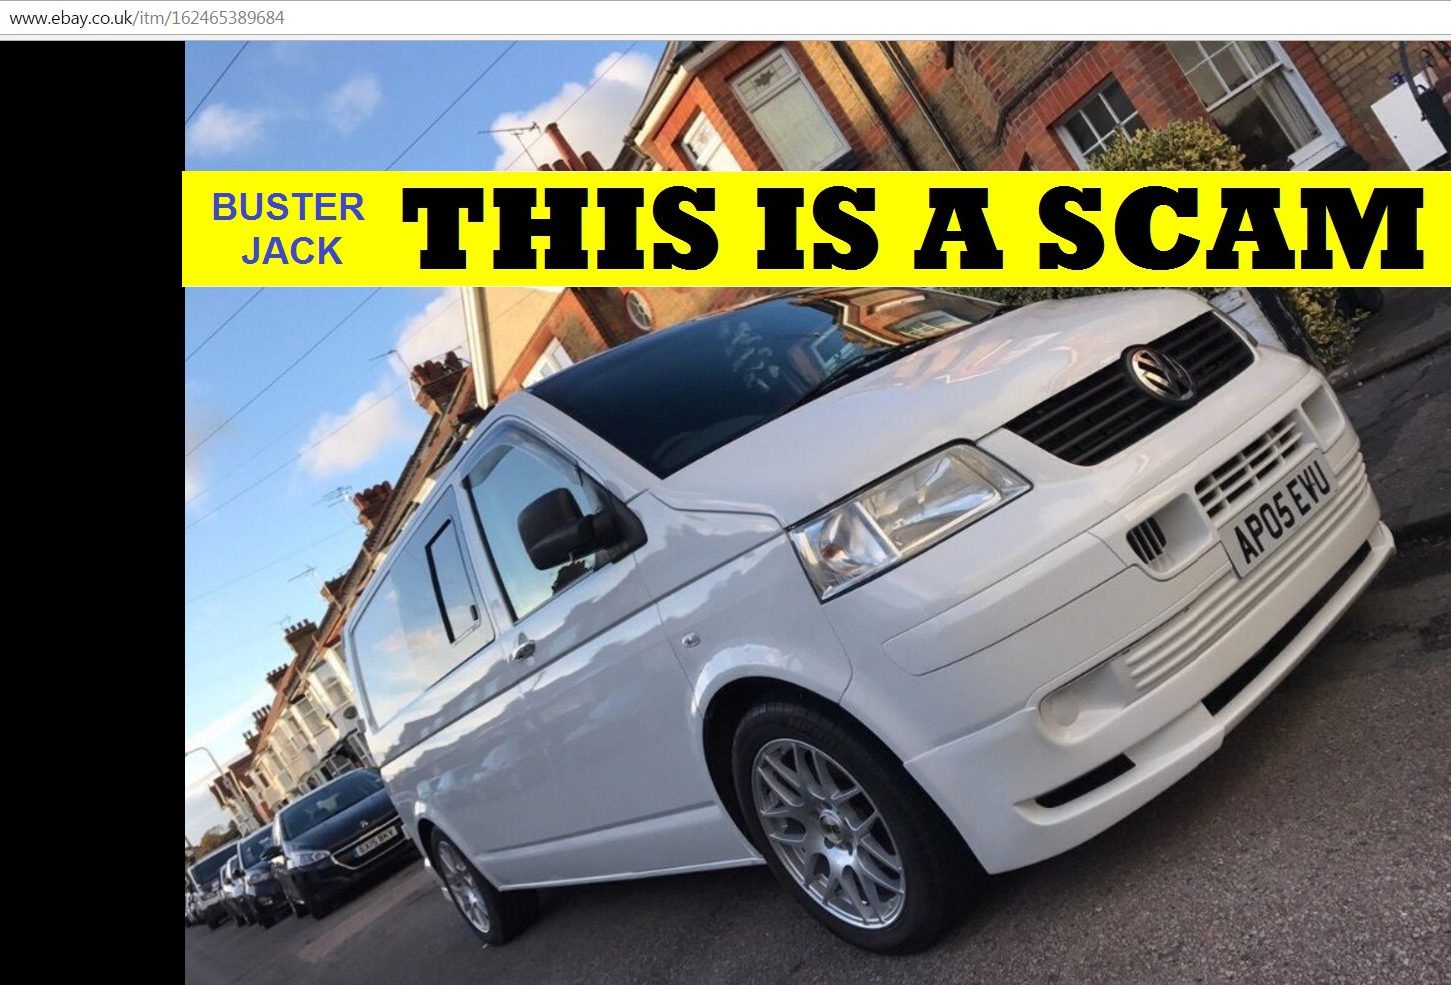 Ebay scam vw t5 transporter campervan ap05evu fx57nxt yk57pon nl59vla pe59kyk l200bah